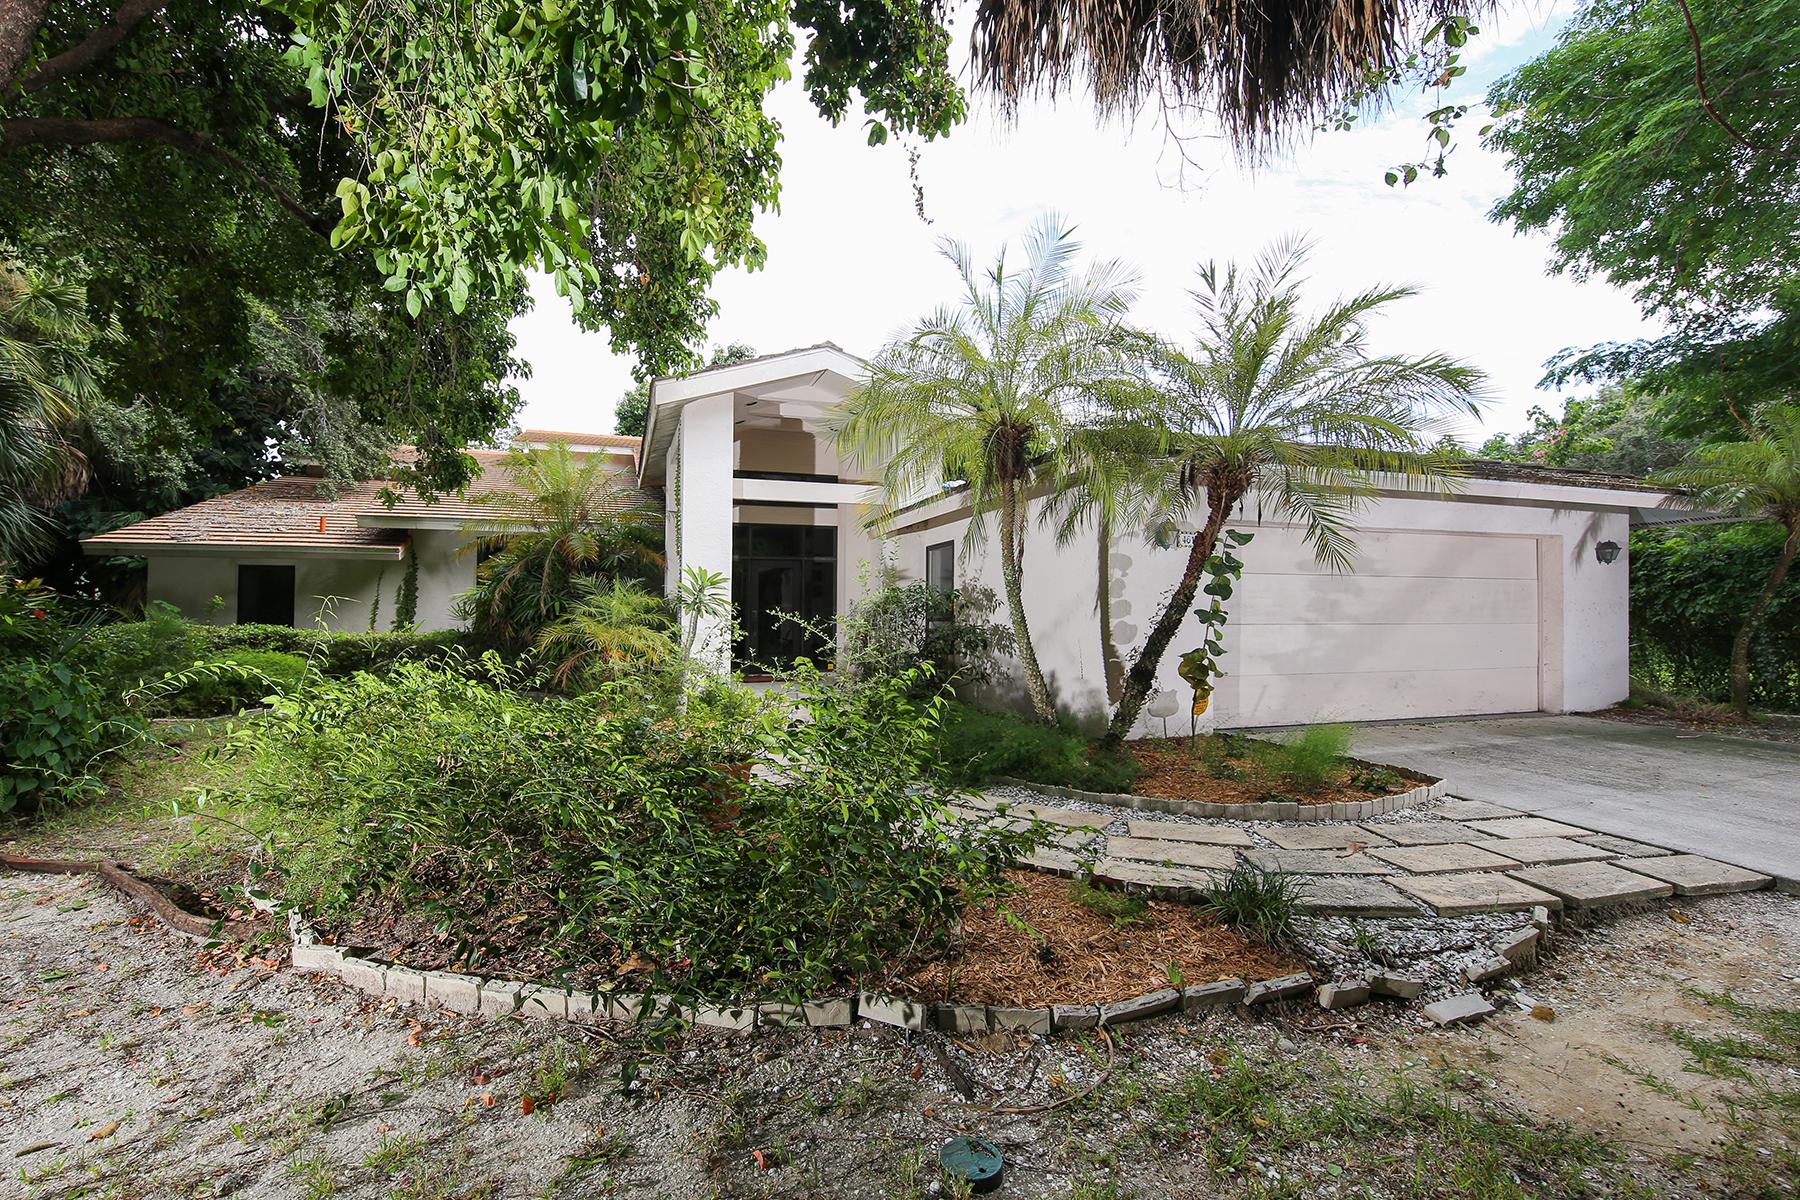 Single Family Home for Sale at SIESTAS BAYSIDE 4619 Higel Ave Sarasota, Florida, 34242 United States